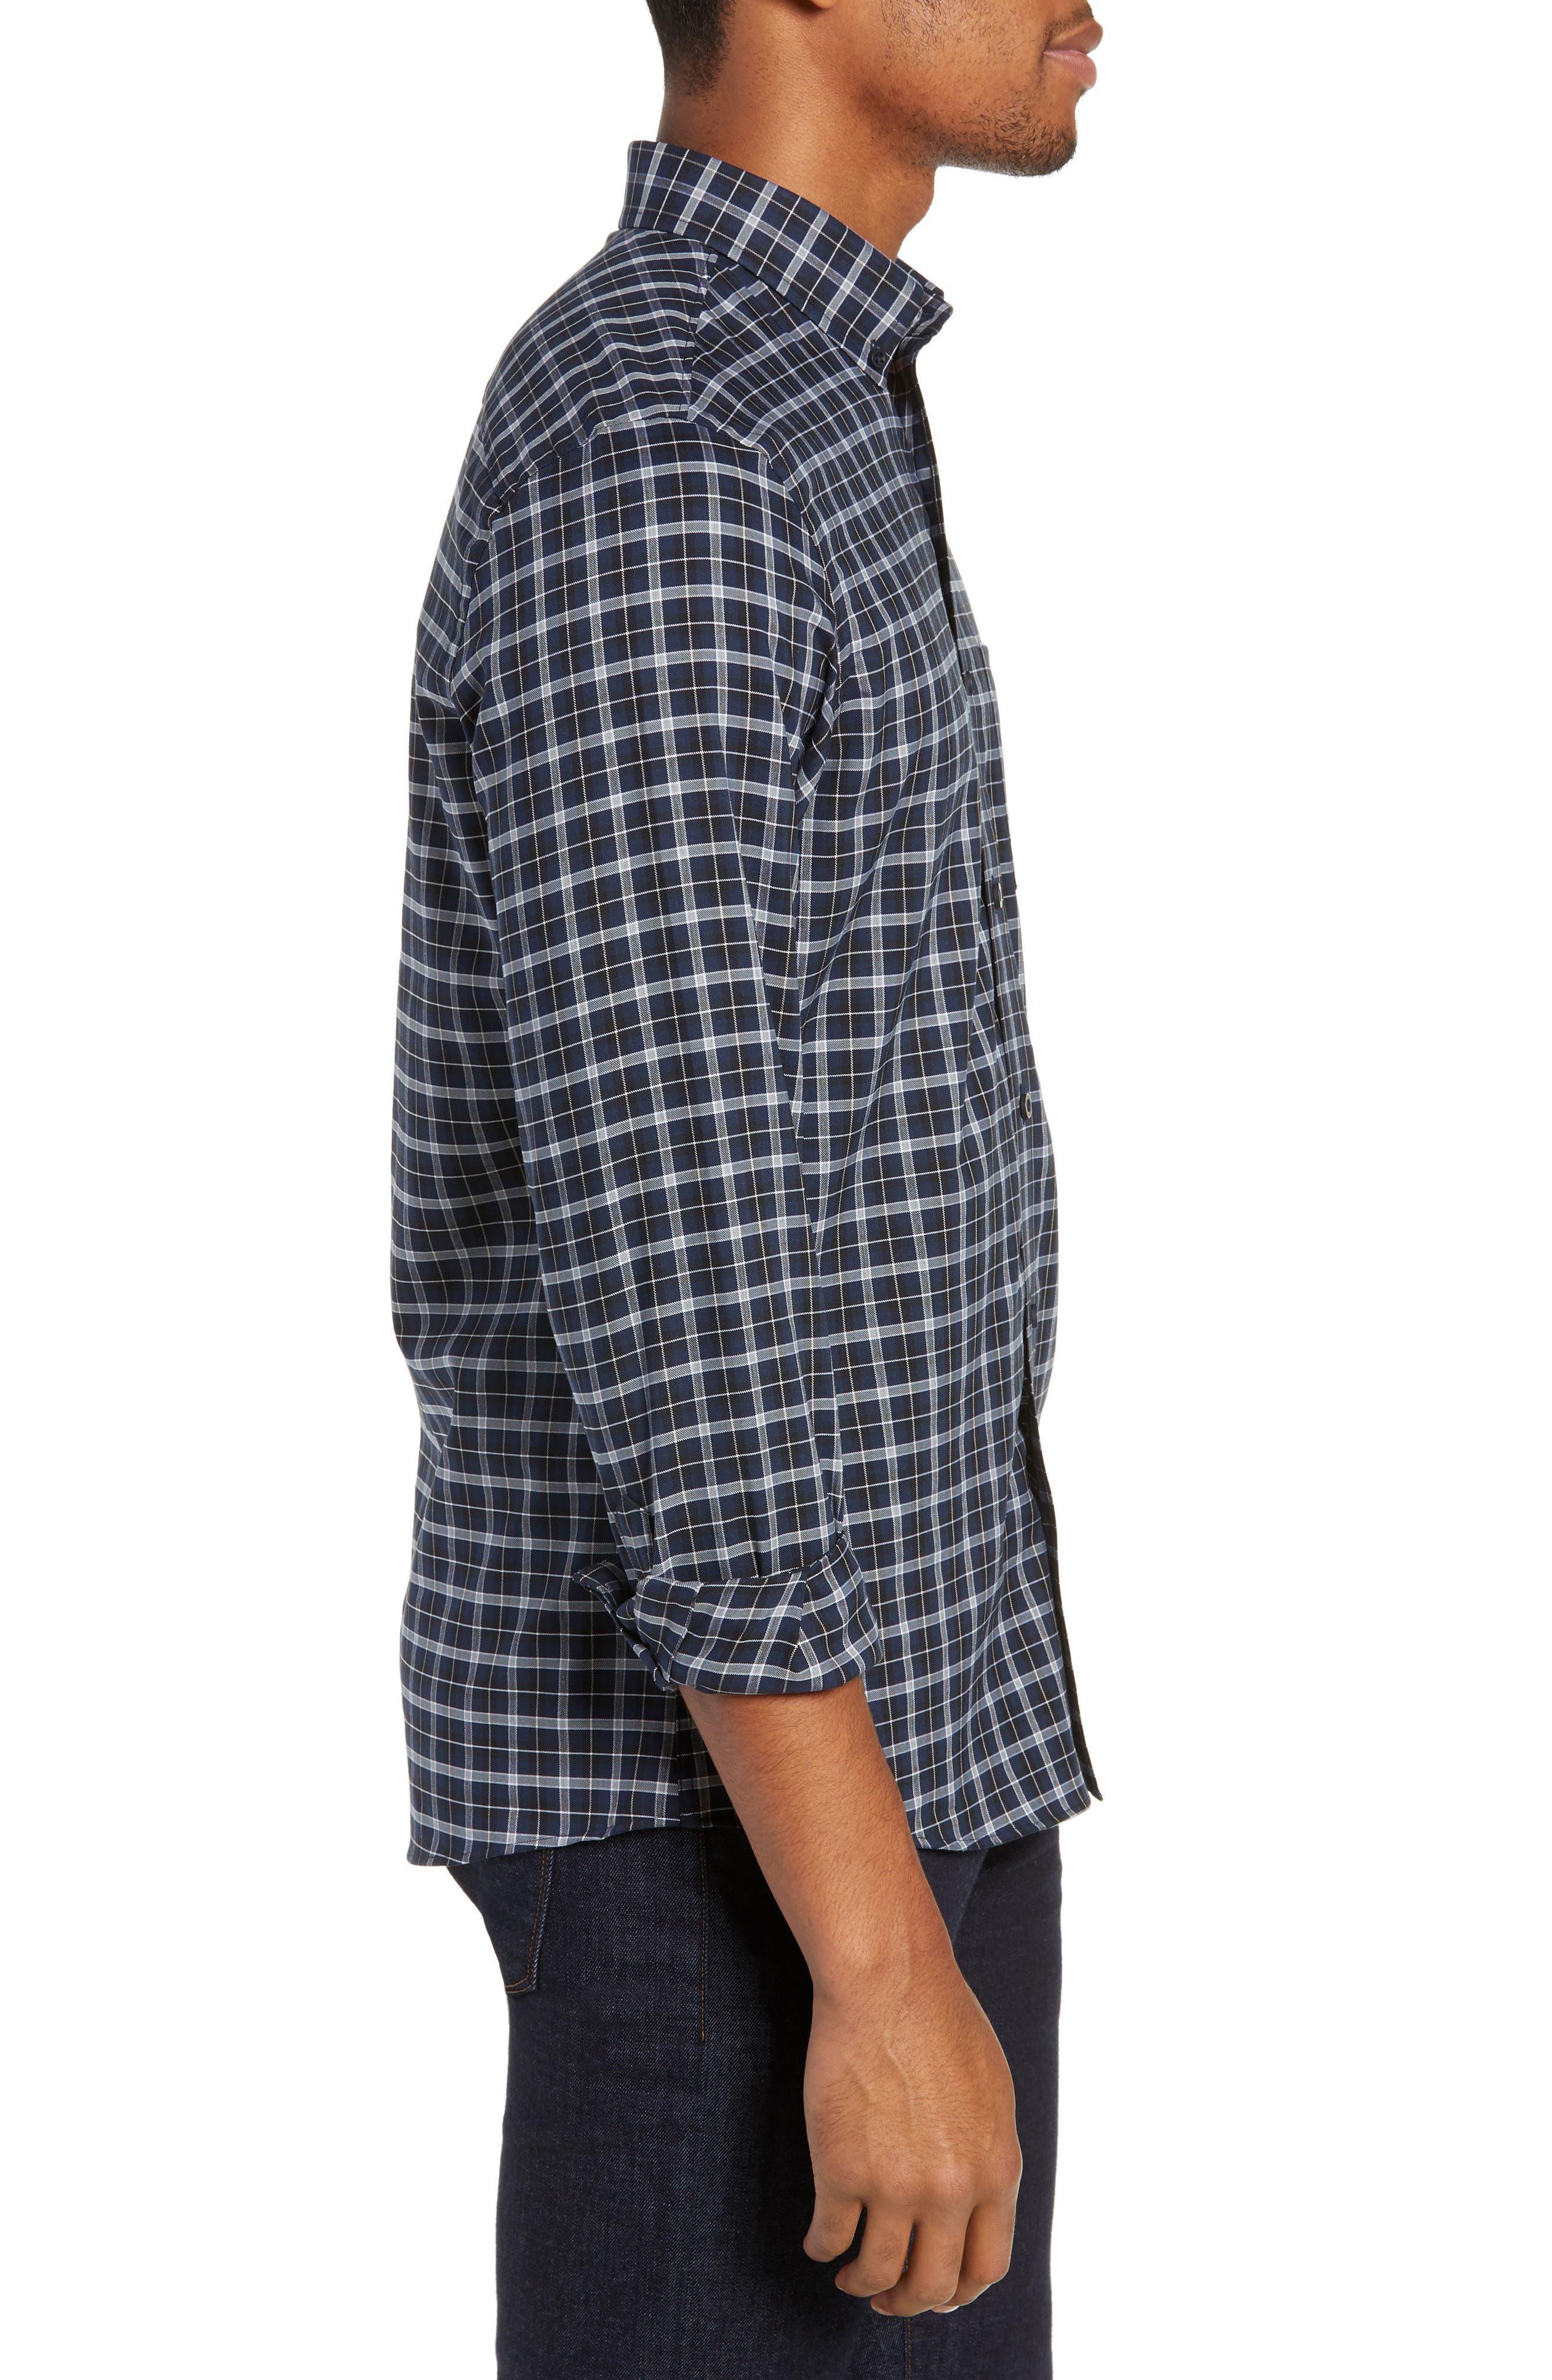 NORDSTROM MEN'S SHOP, Tech-Smart Slim Fit Check Sport Shirt, Alternate thumbnail 4, color, NAVY IRIS BLACK CHECK